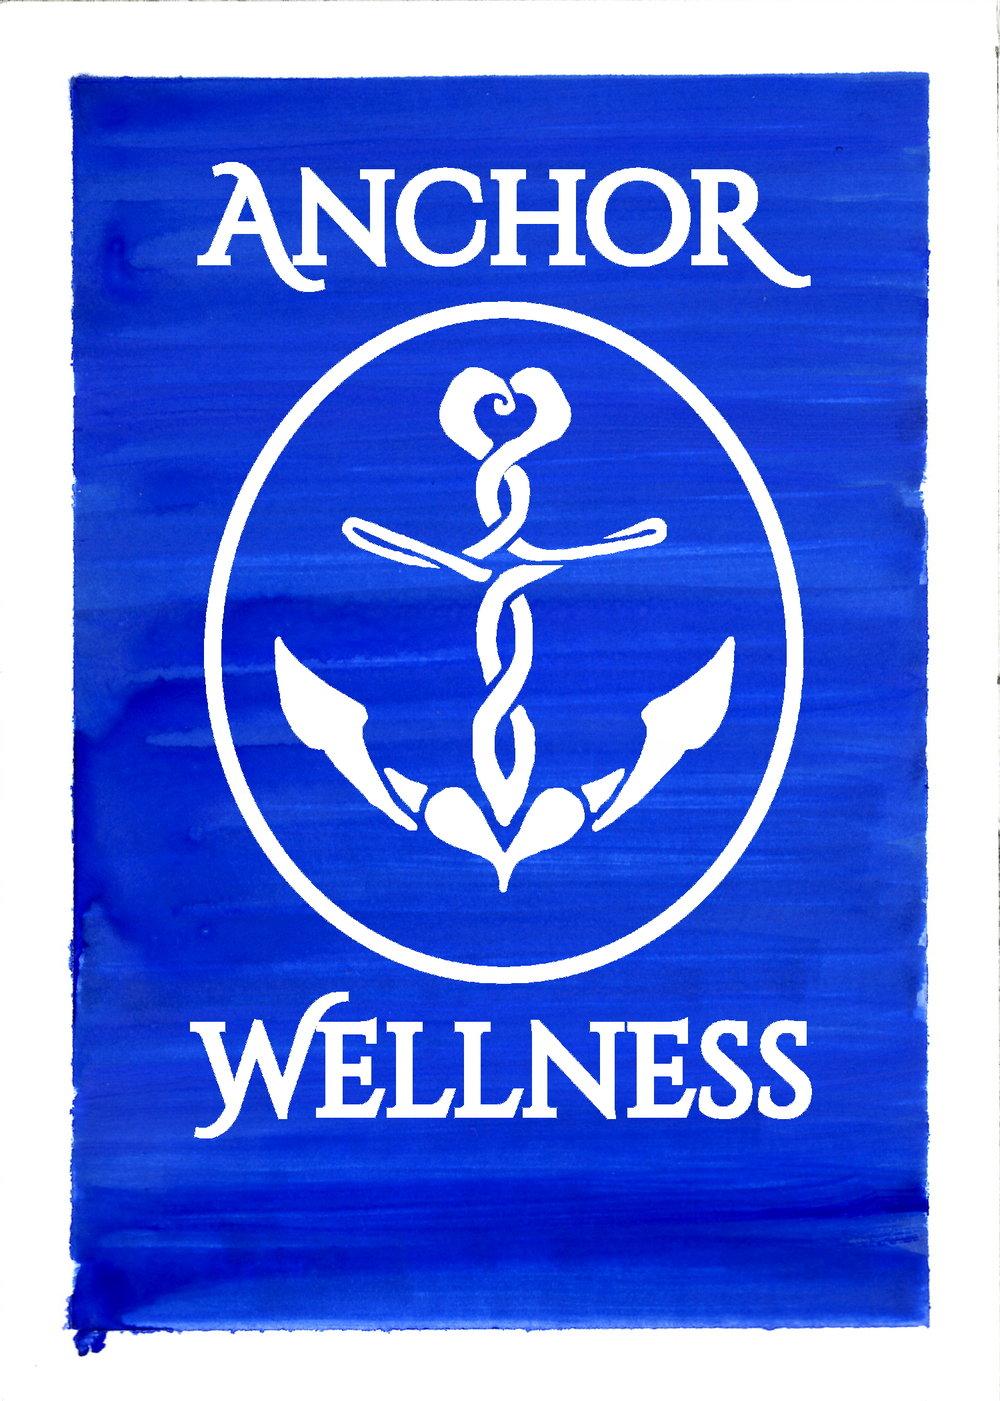 Copyright 2015 Anchor Wellness